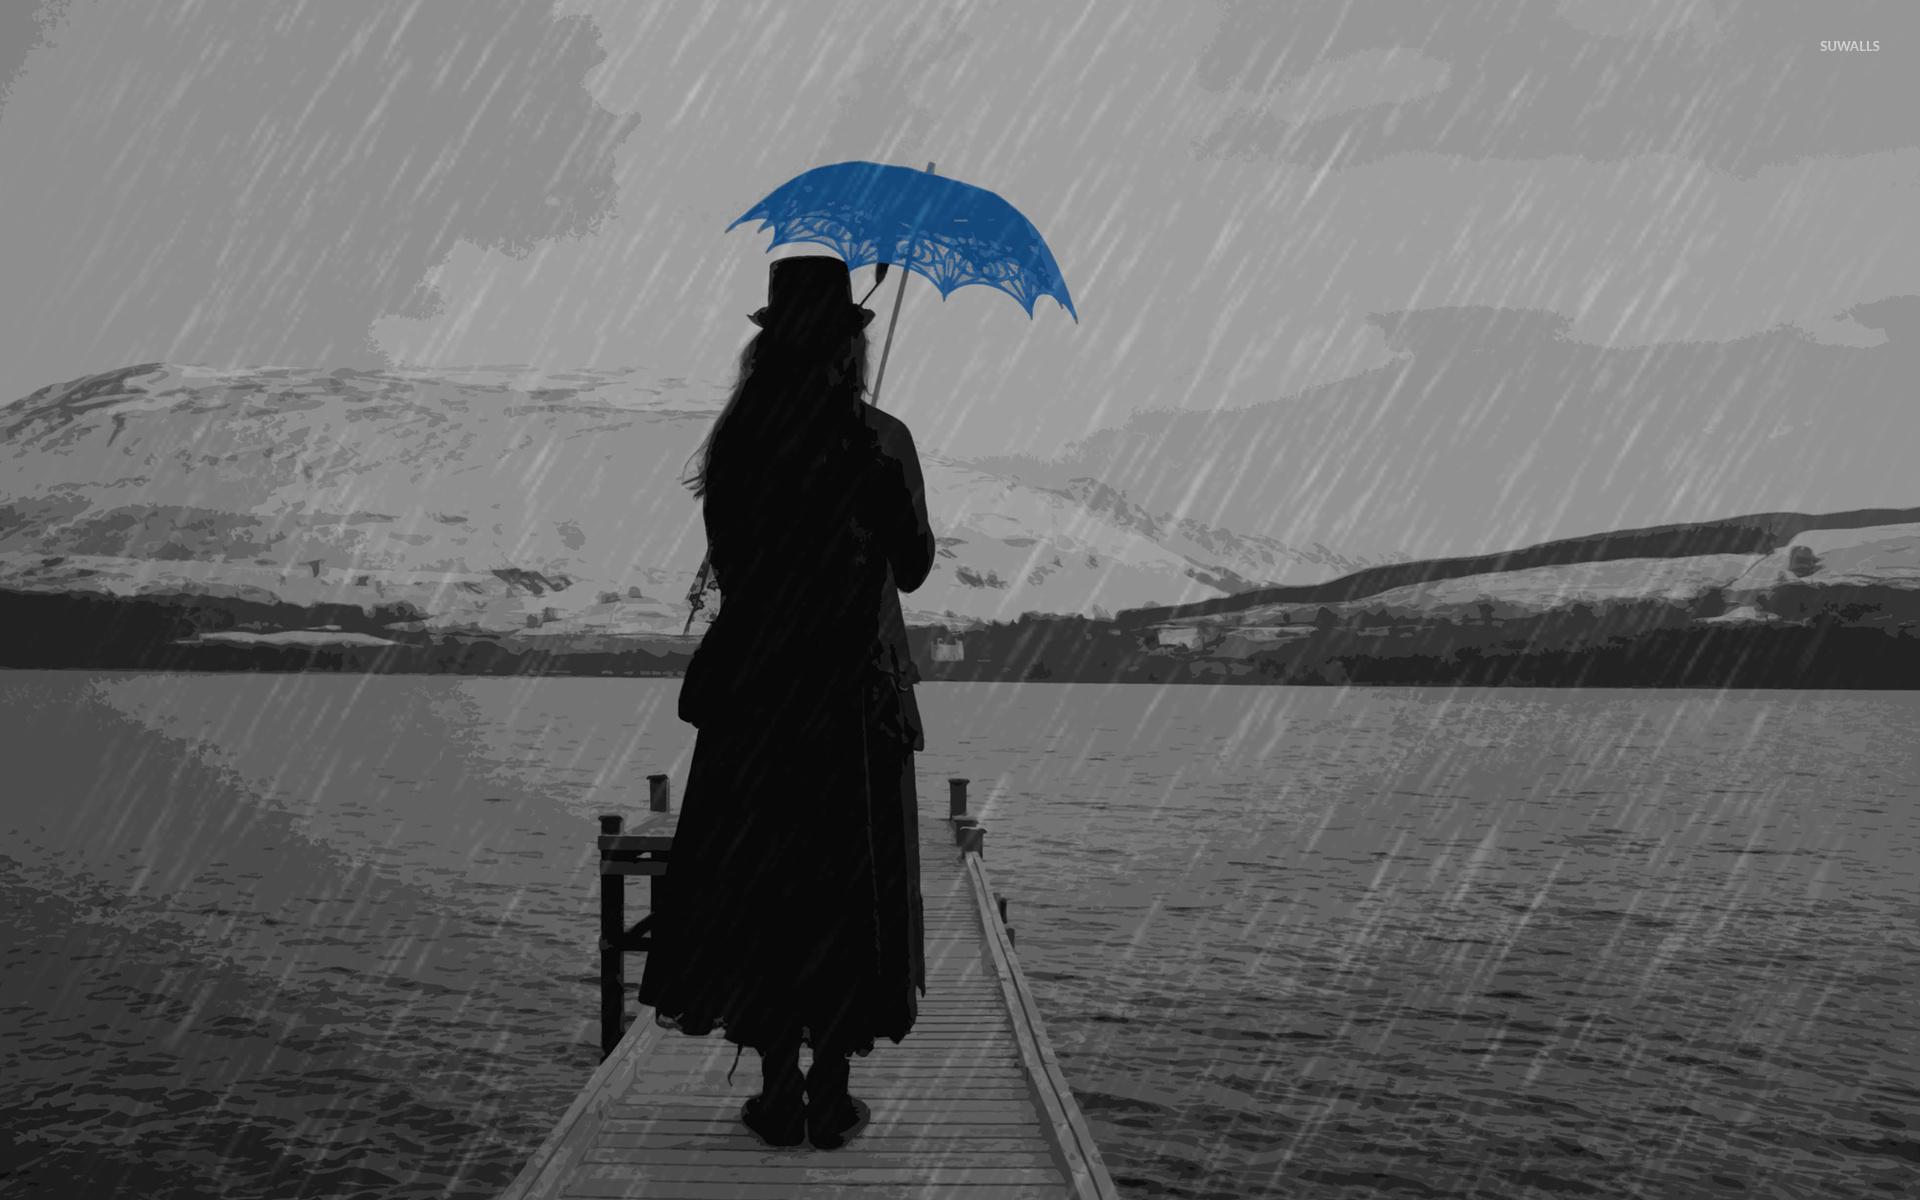 Lady In Black Under A Blue Umbrella Wallpaper